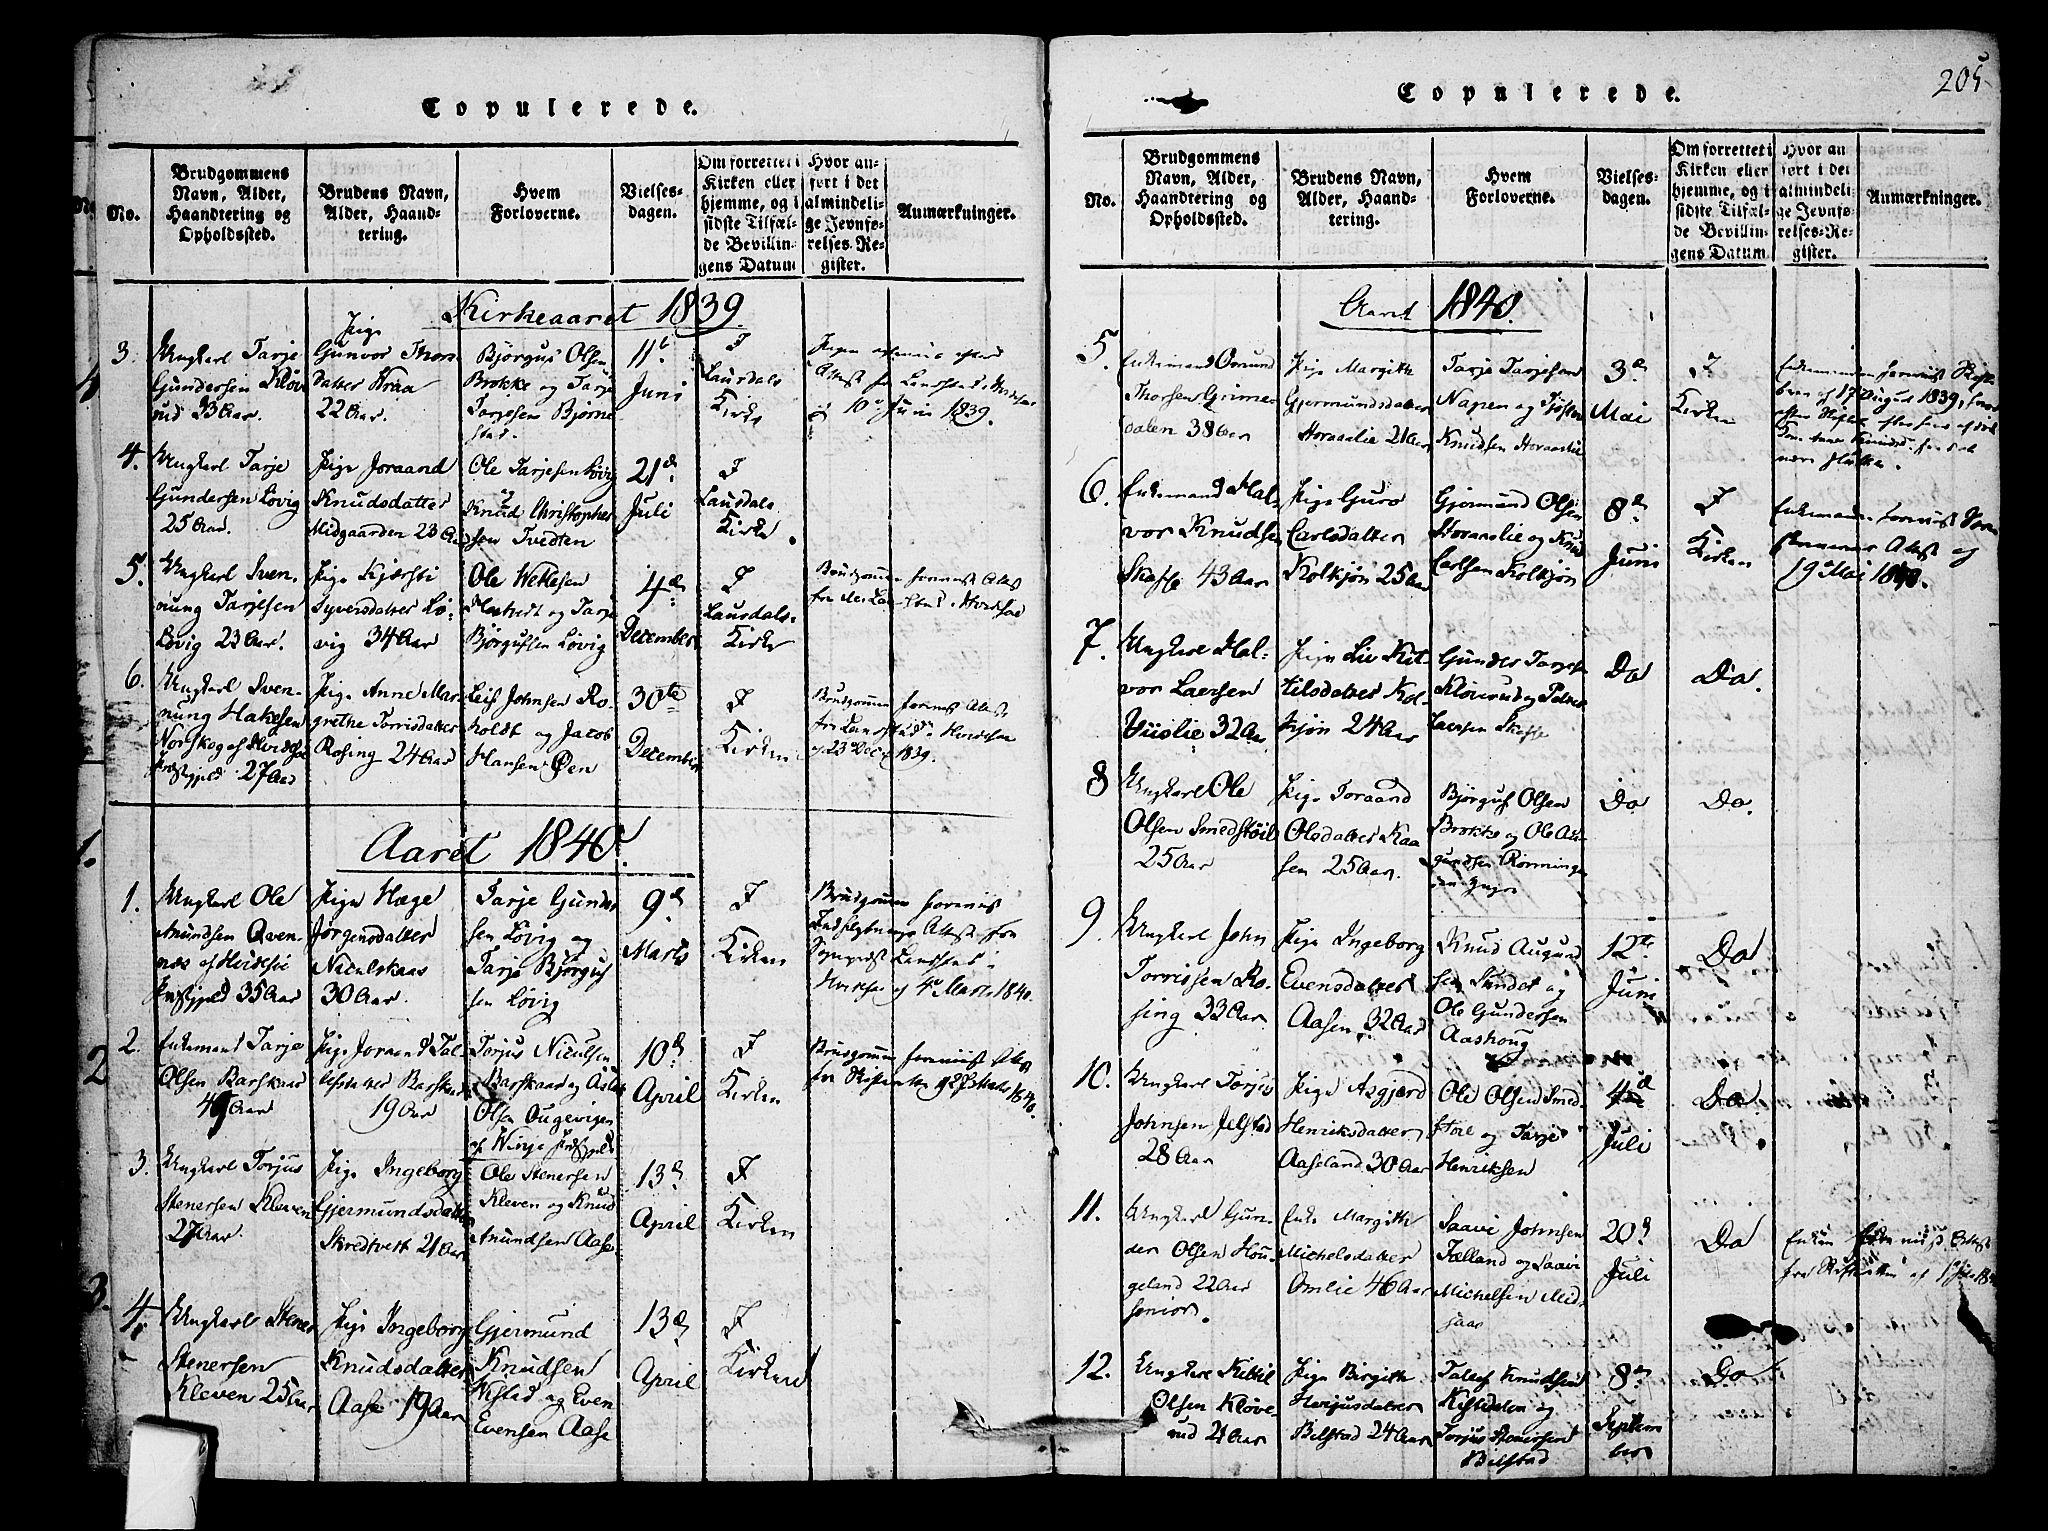 SAKO, Mo kirkebøker, F/Fb/L0001: Ministerialbok nr. II 1, 1814-1844, s. 205